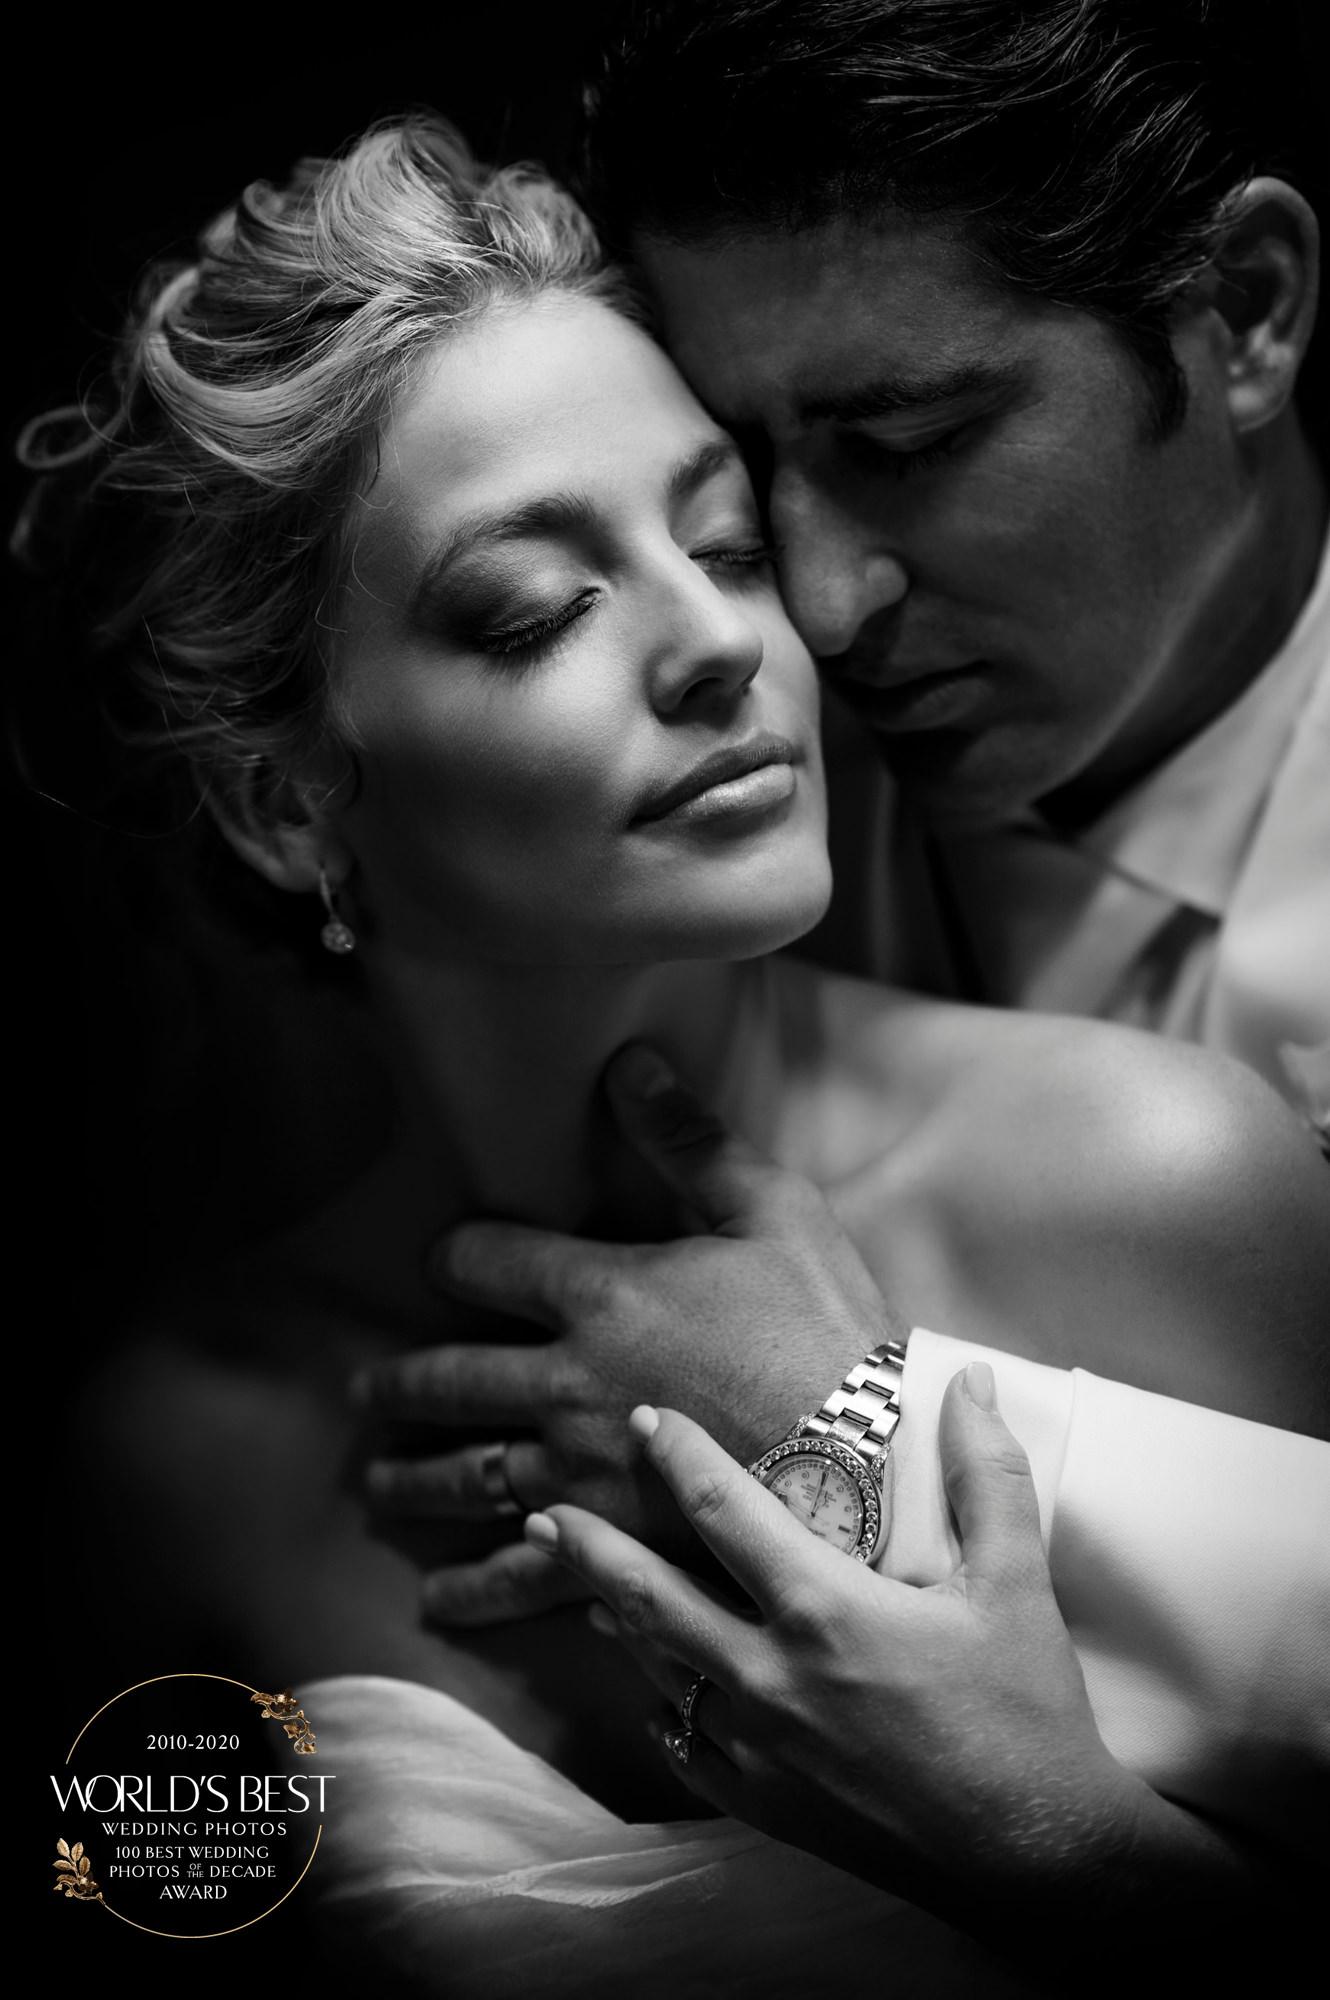 Award-winning, black and white portrait of couple by Ben Chrisman of Chrisman Studios - South Carolina